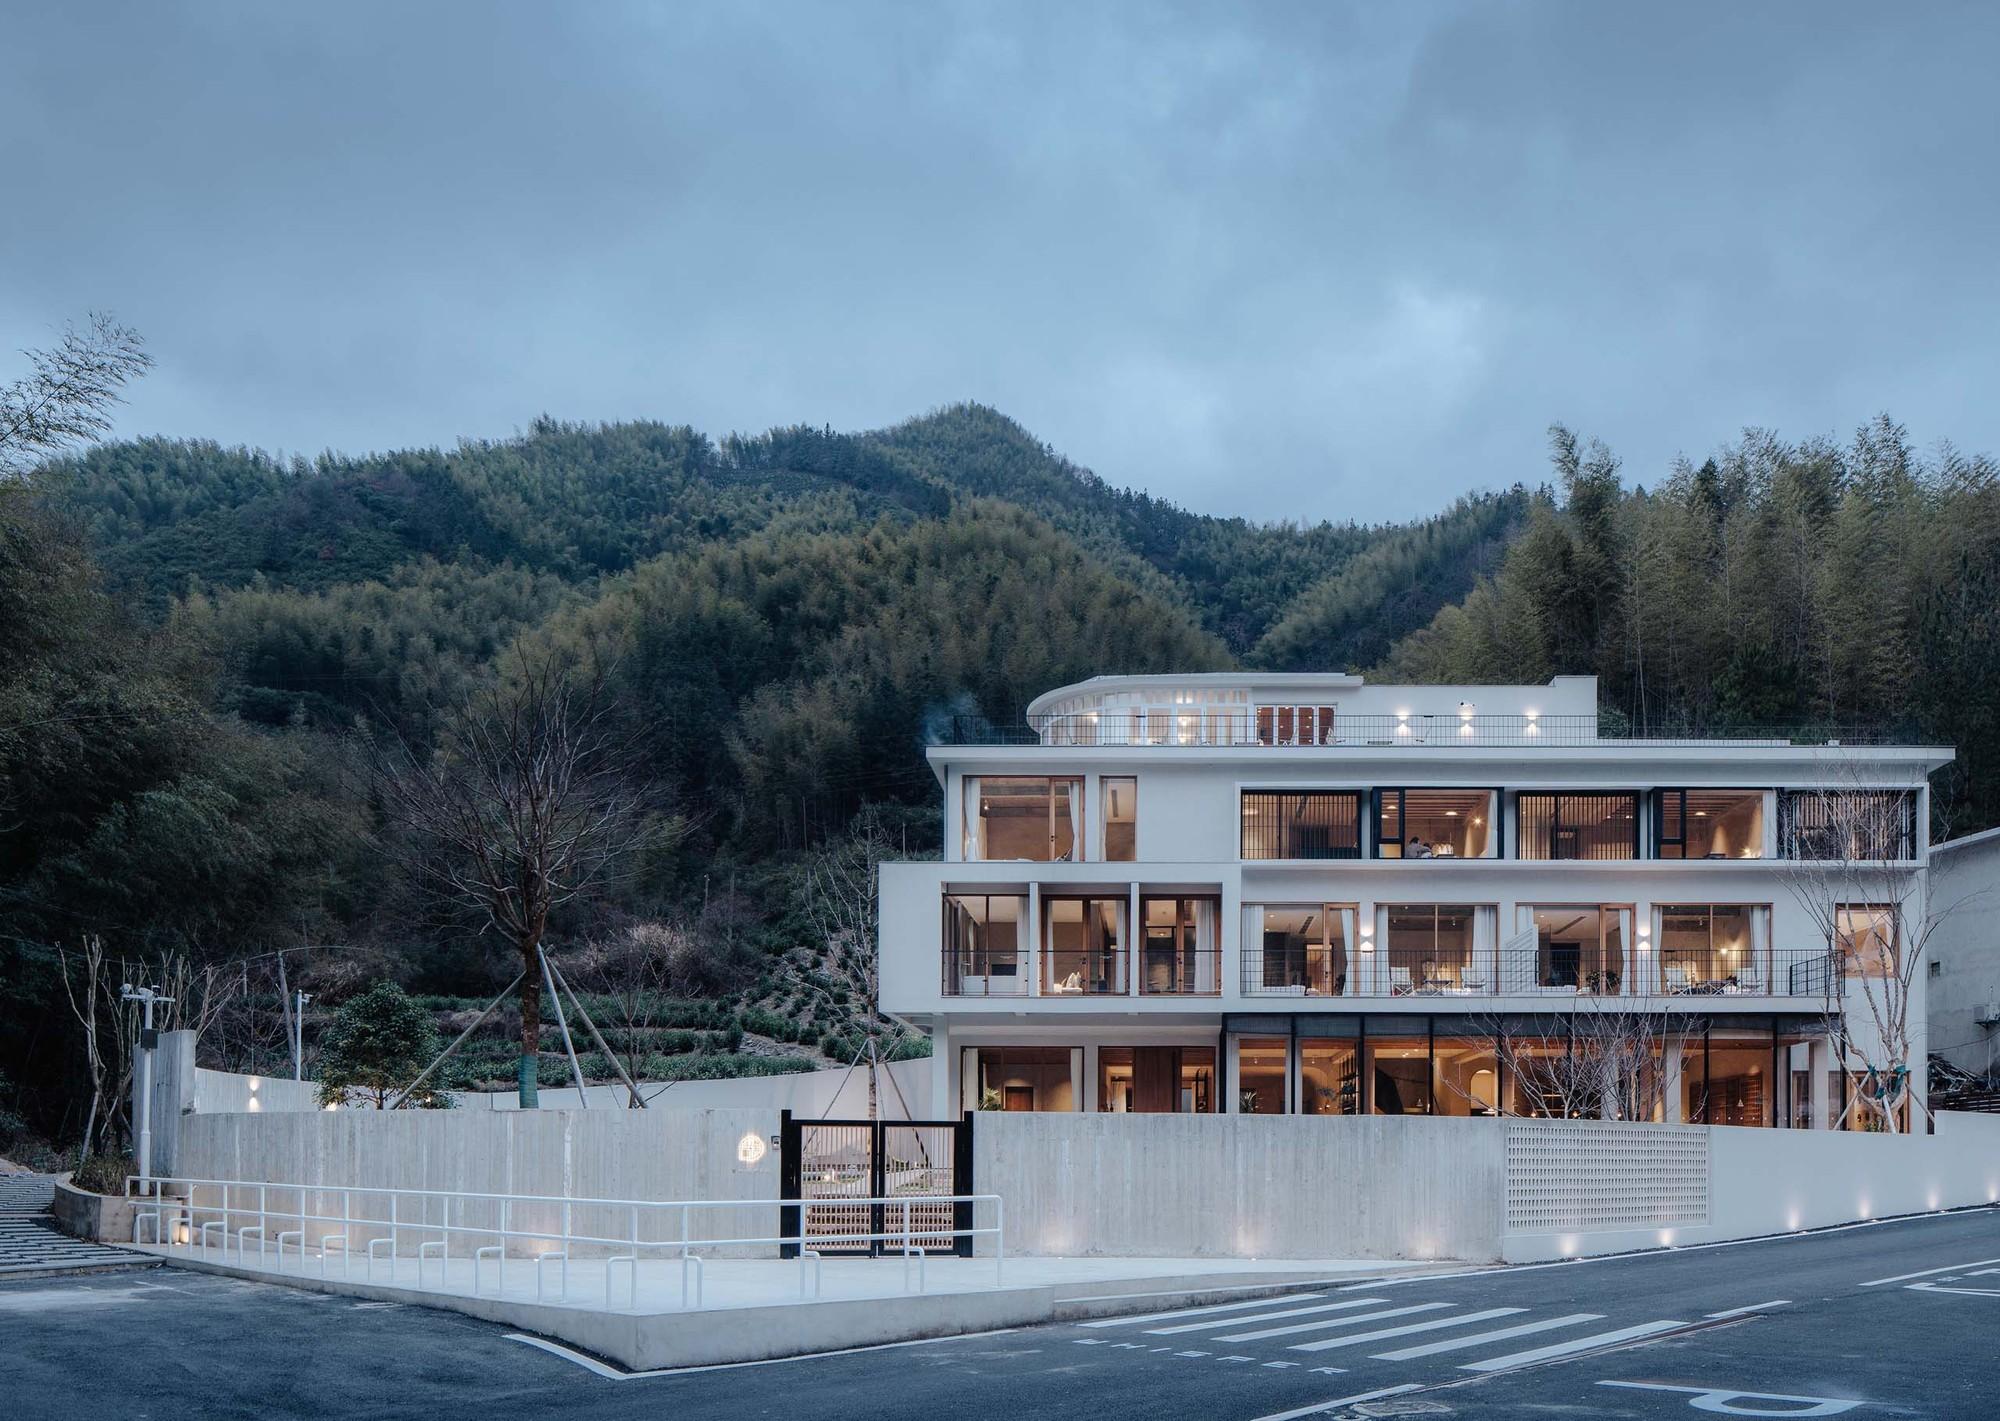 Whisper Hotel / qpdro